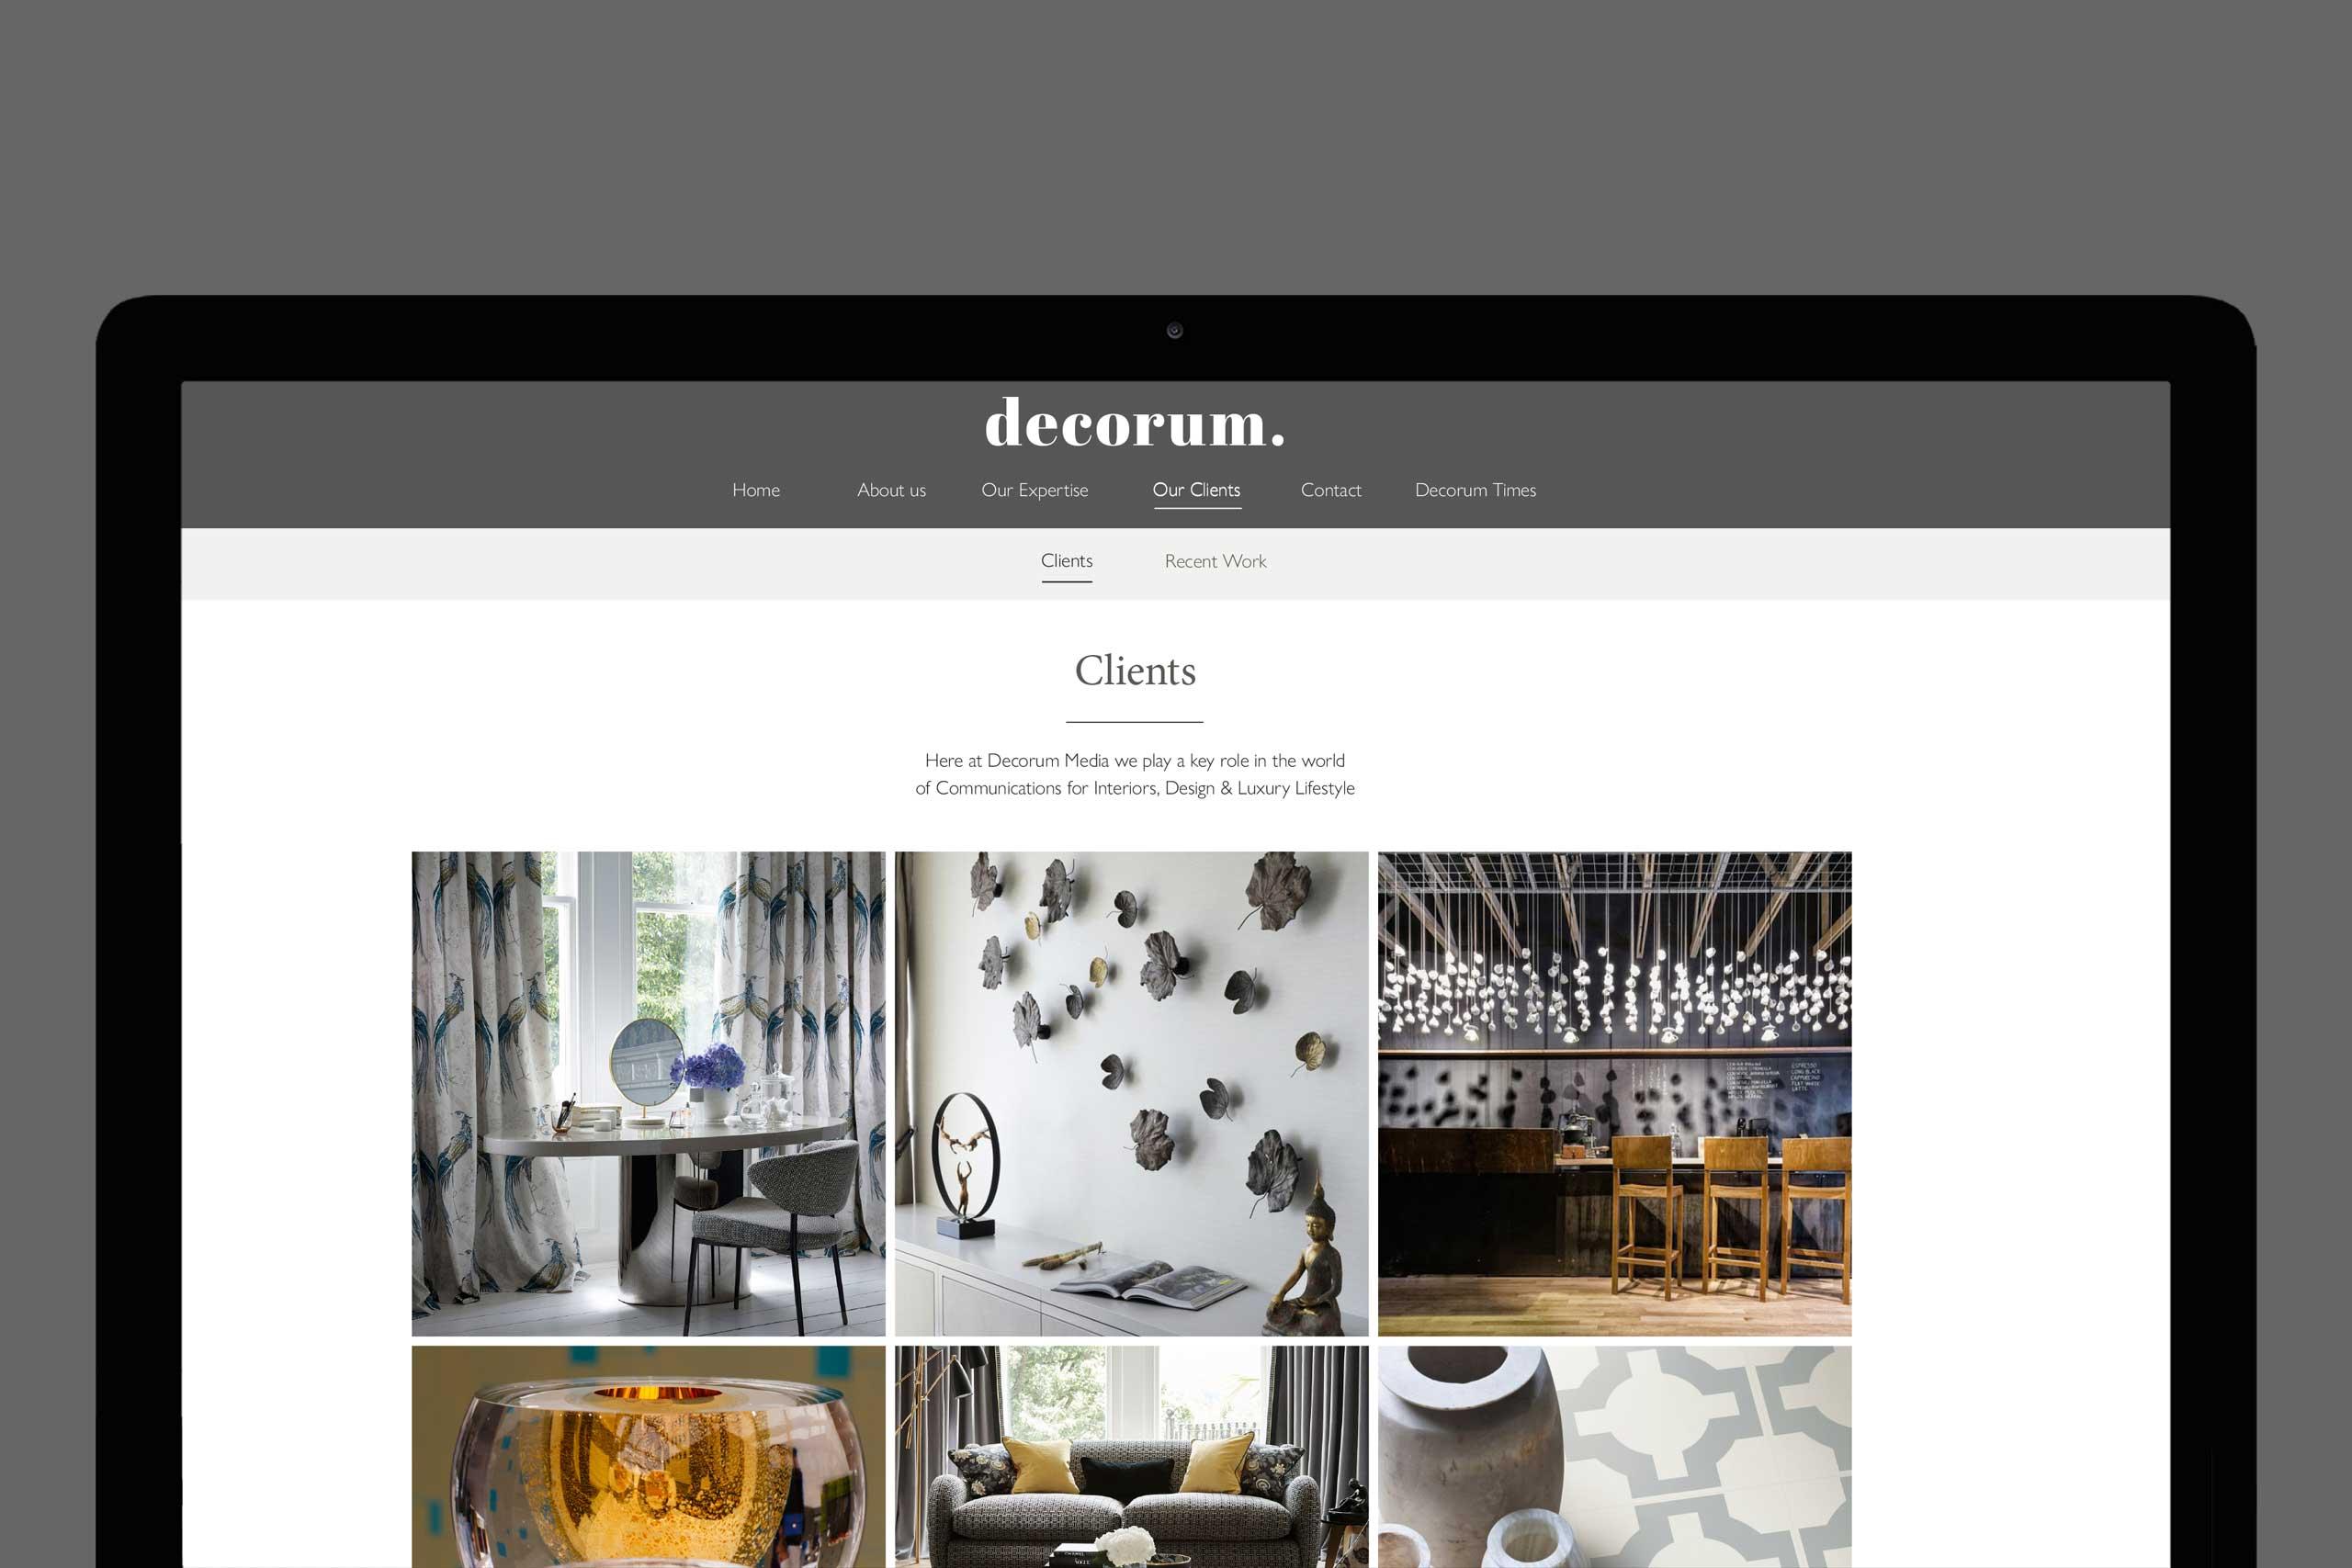 Brand marketing for interiors Decorum media 2015 clients